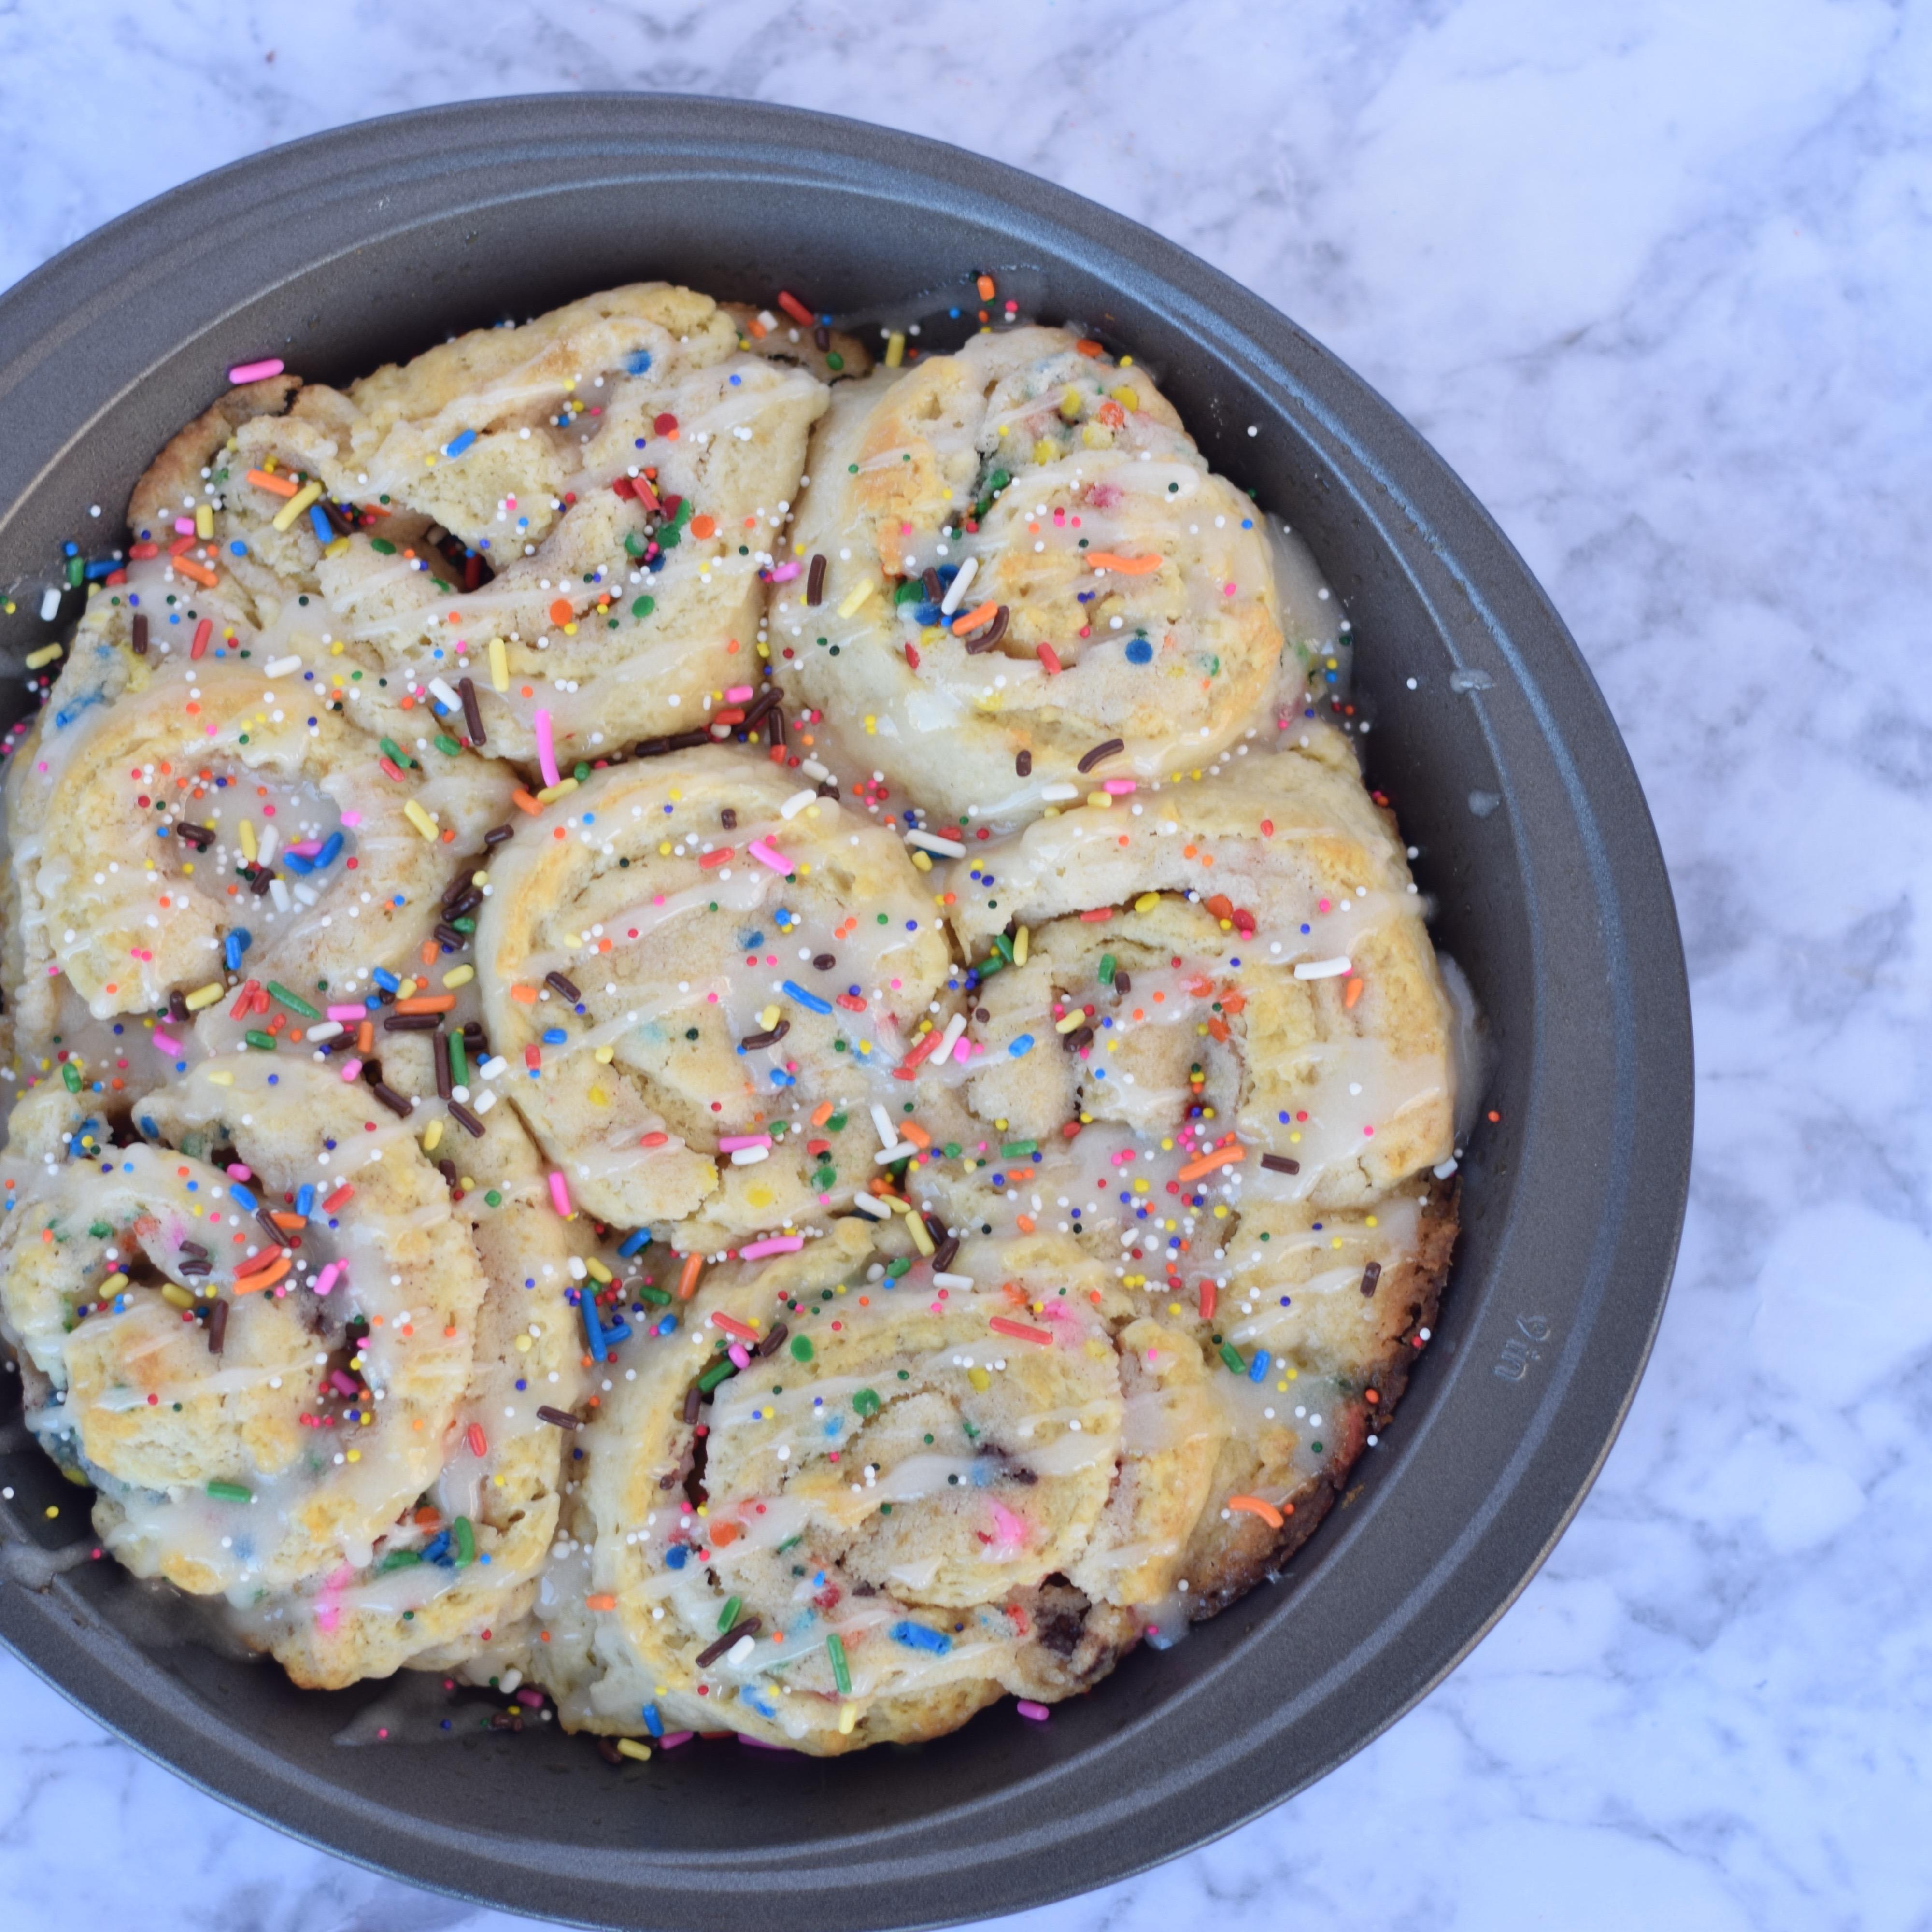 cake-batter-cinnamon-roll-recipe2